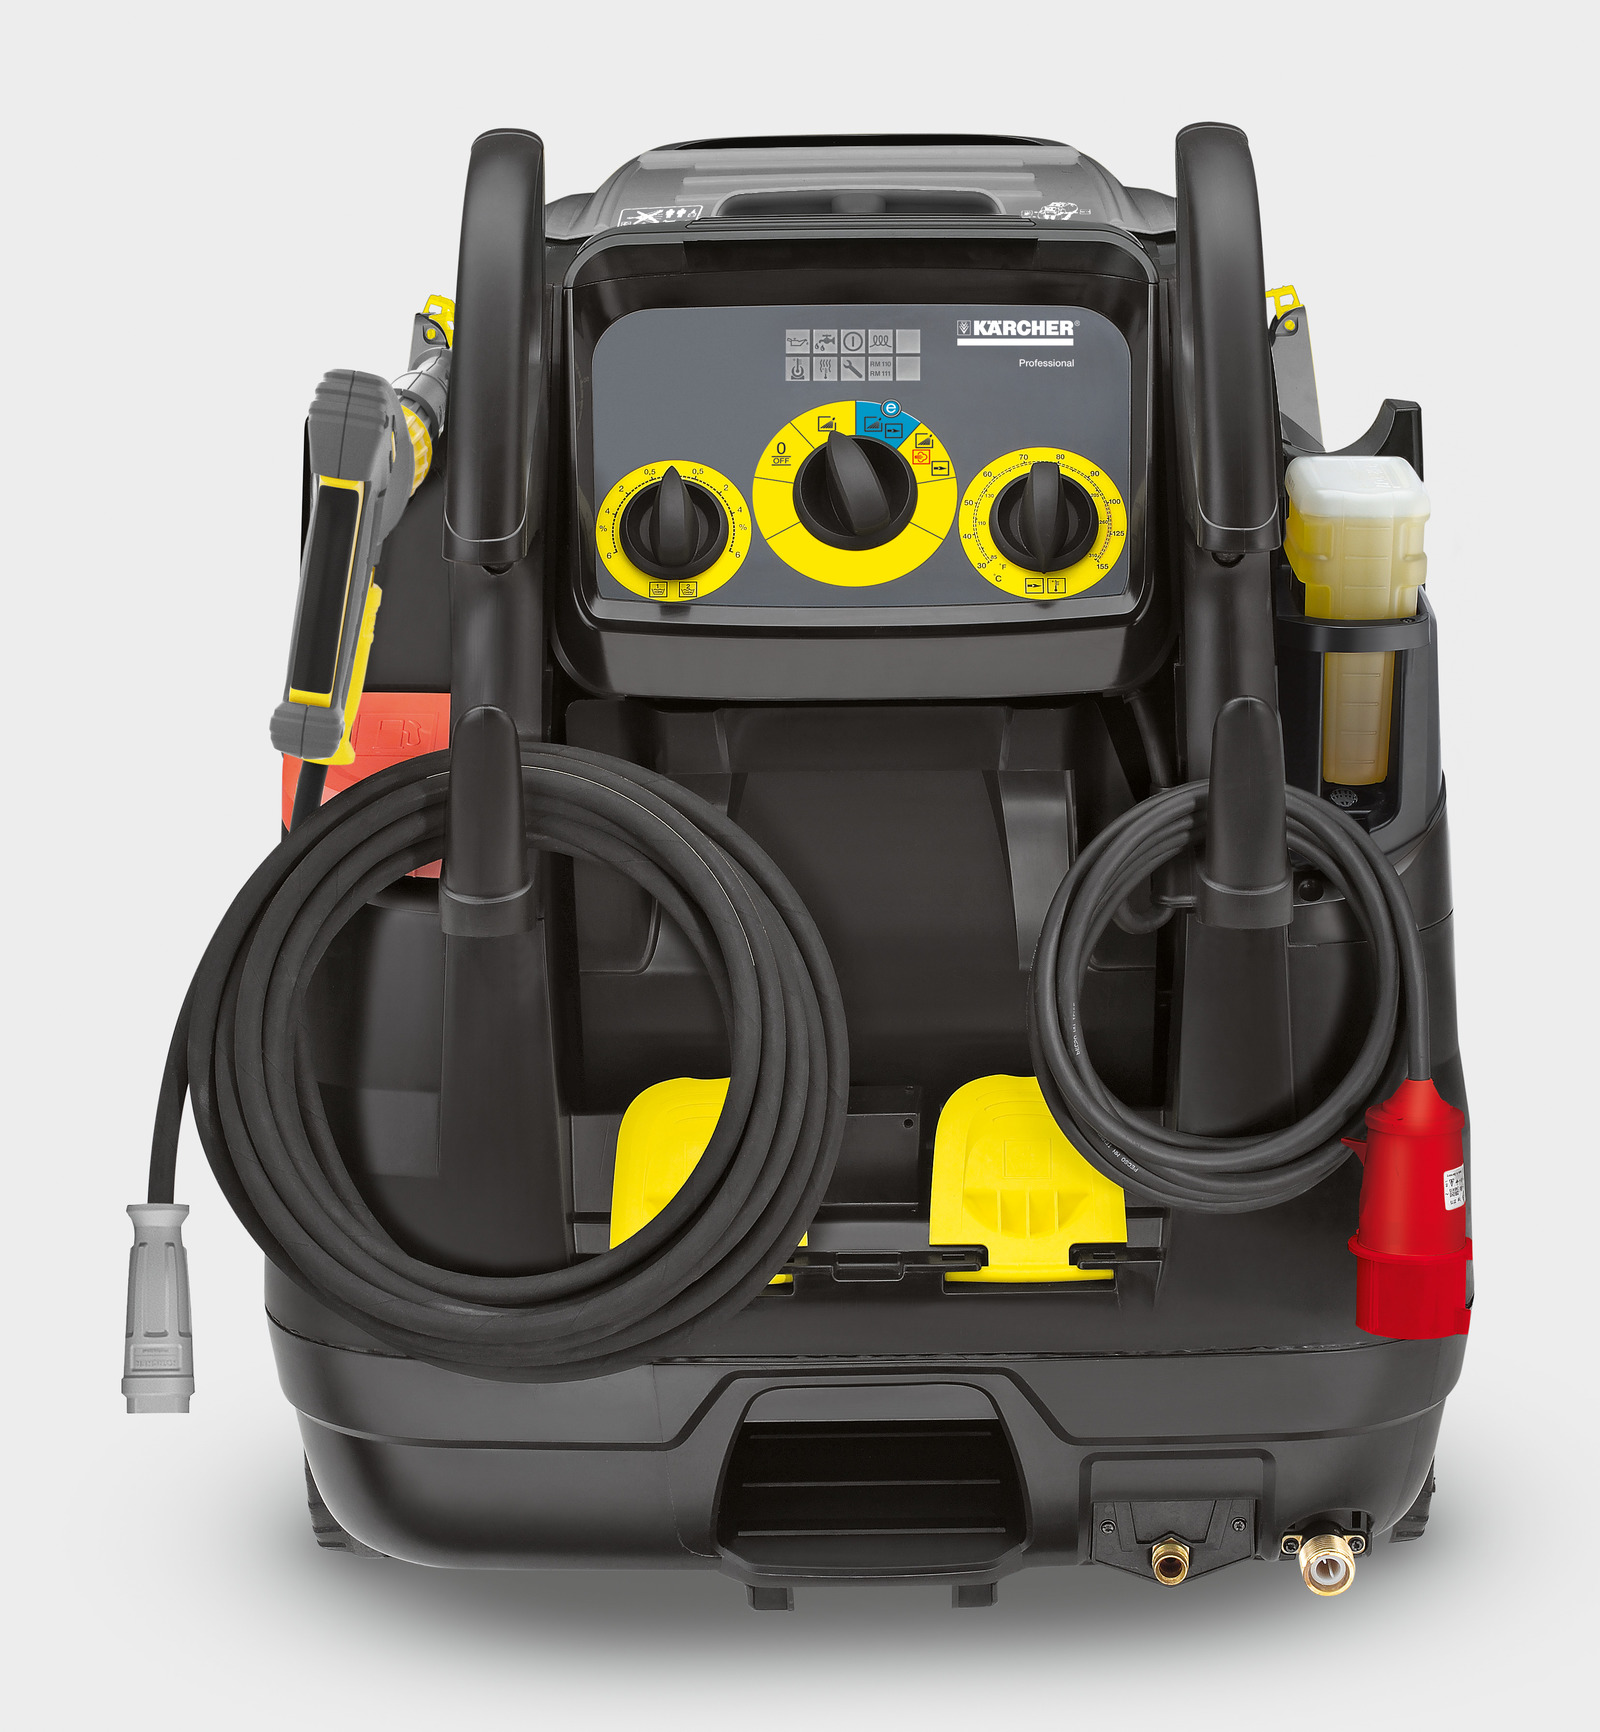 Hds 750 Operator Manual Karcher 580 Wiring Diagram Array High Pressure Washer 7 10 4 M K Rcher Uk Rh Kaercher Com